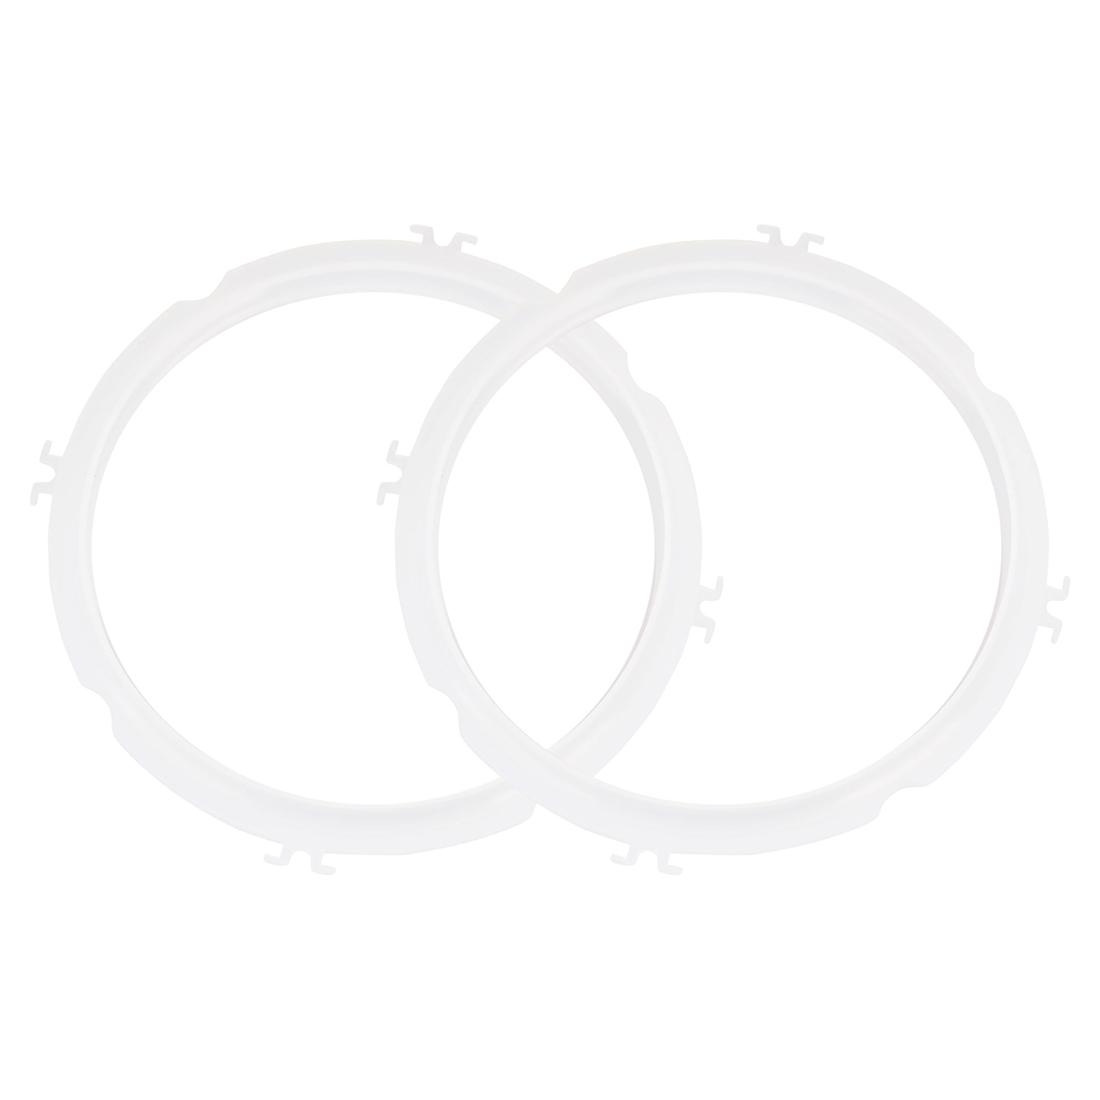 "2pcs Silicone Gasket Sealing Ring Sealer Inner Dia - 8.7"", Fits 5/6 QT Models"